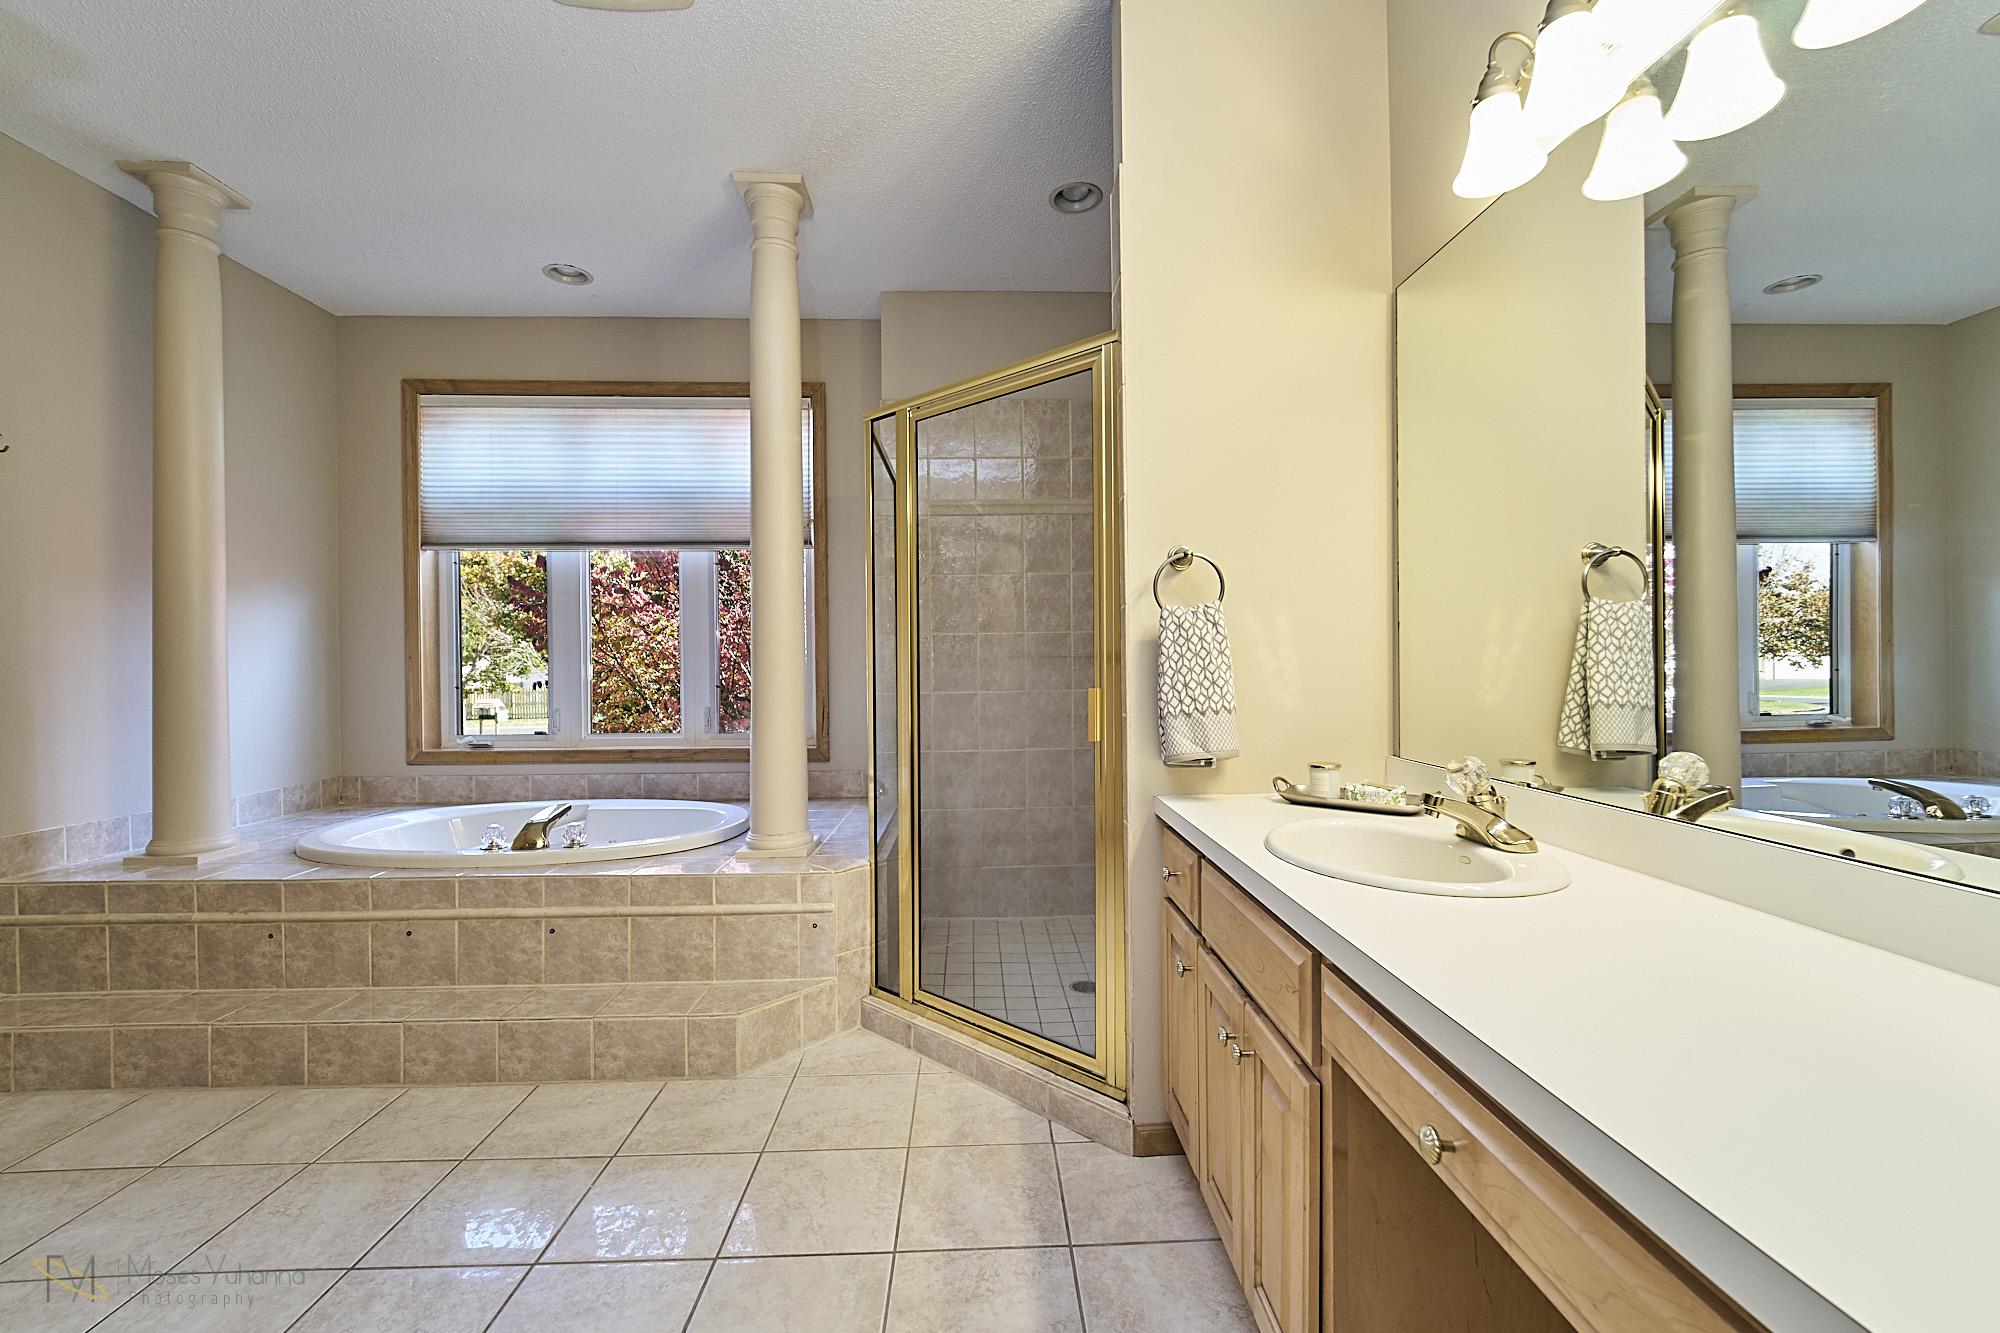 13770-Cottonwood-St-NW-Andover 14 MR Bath.jpg